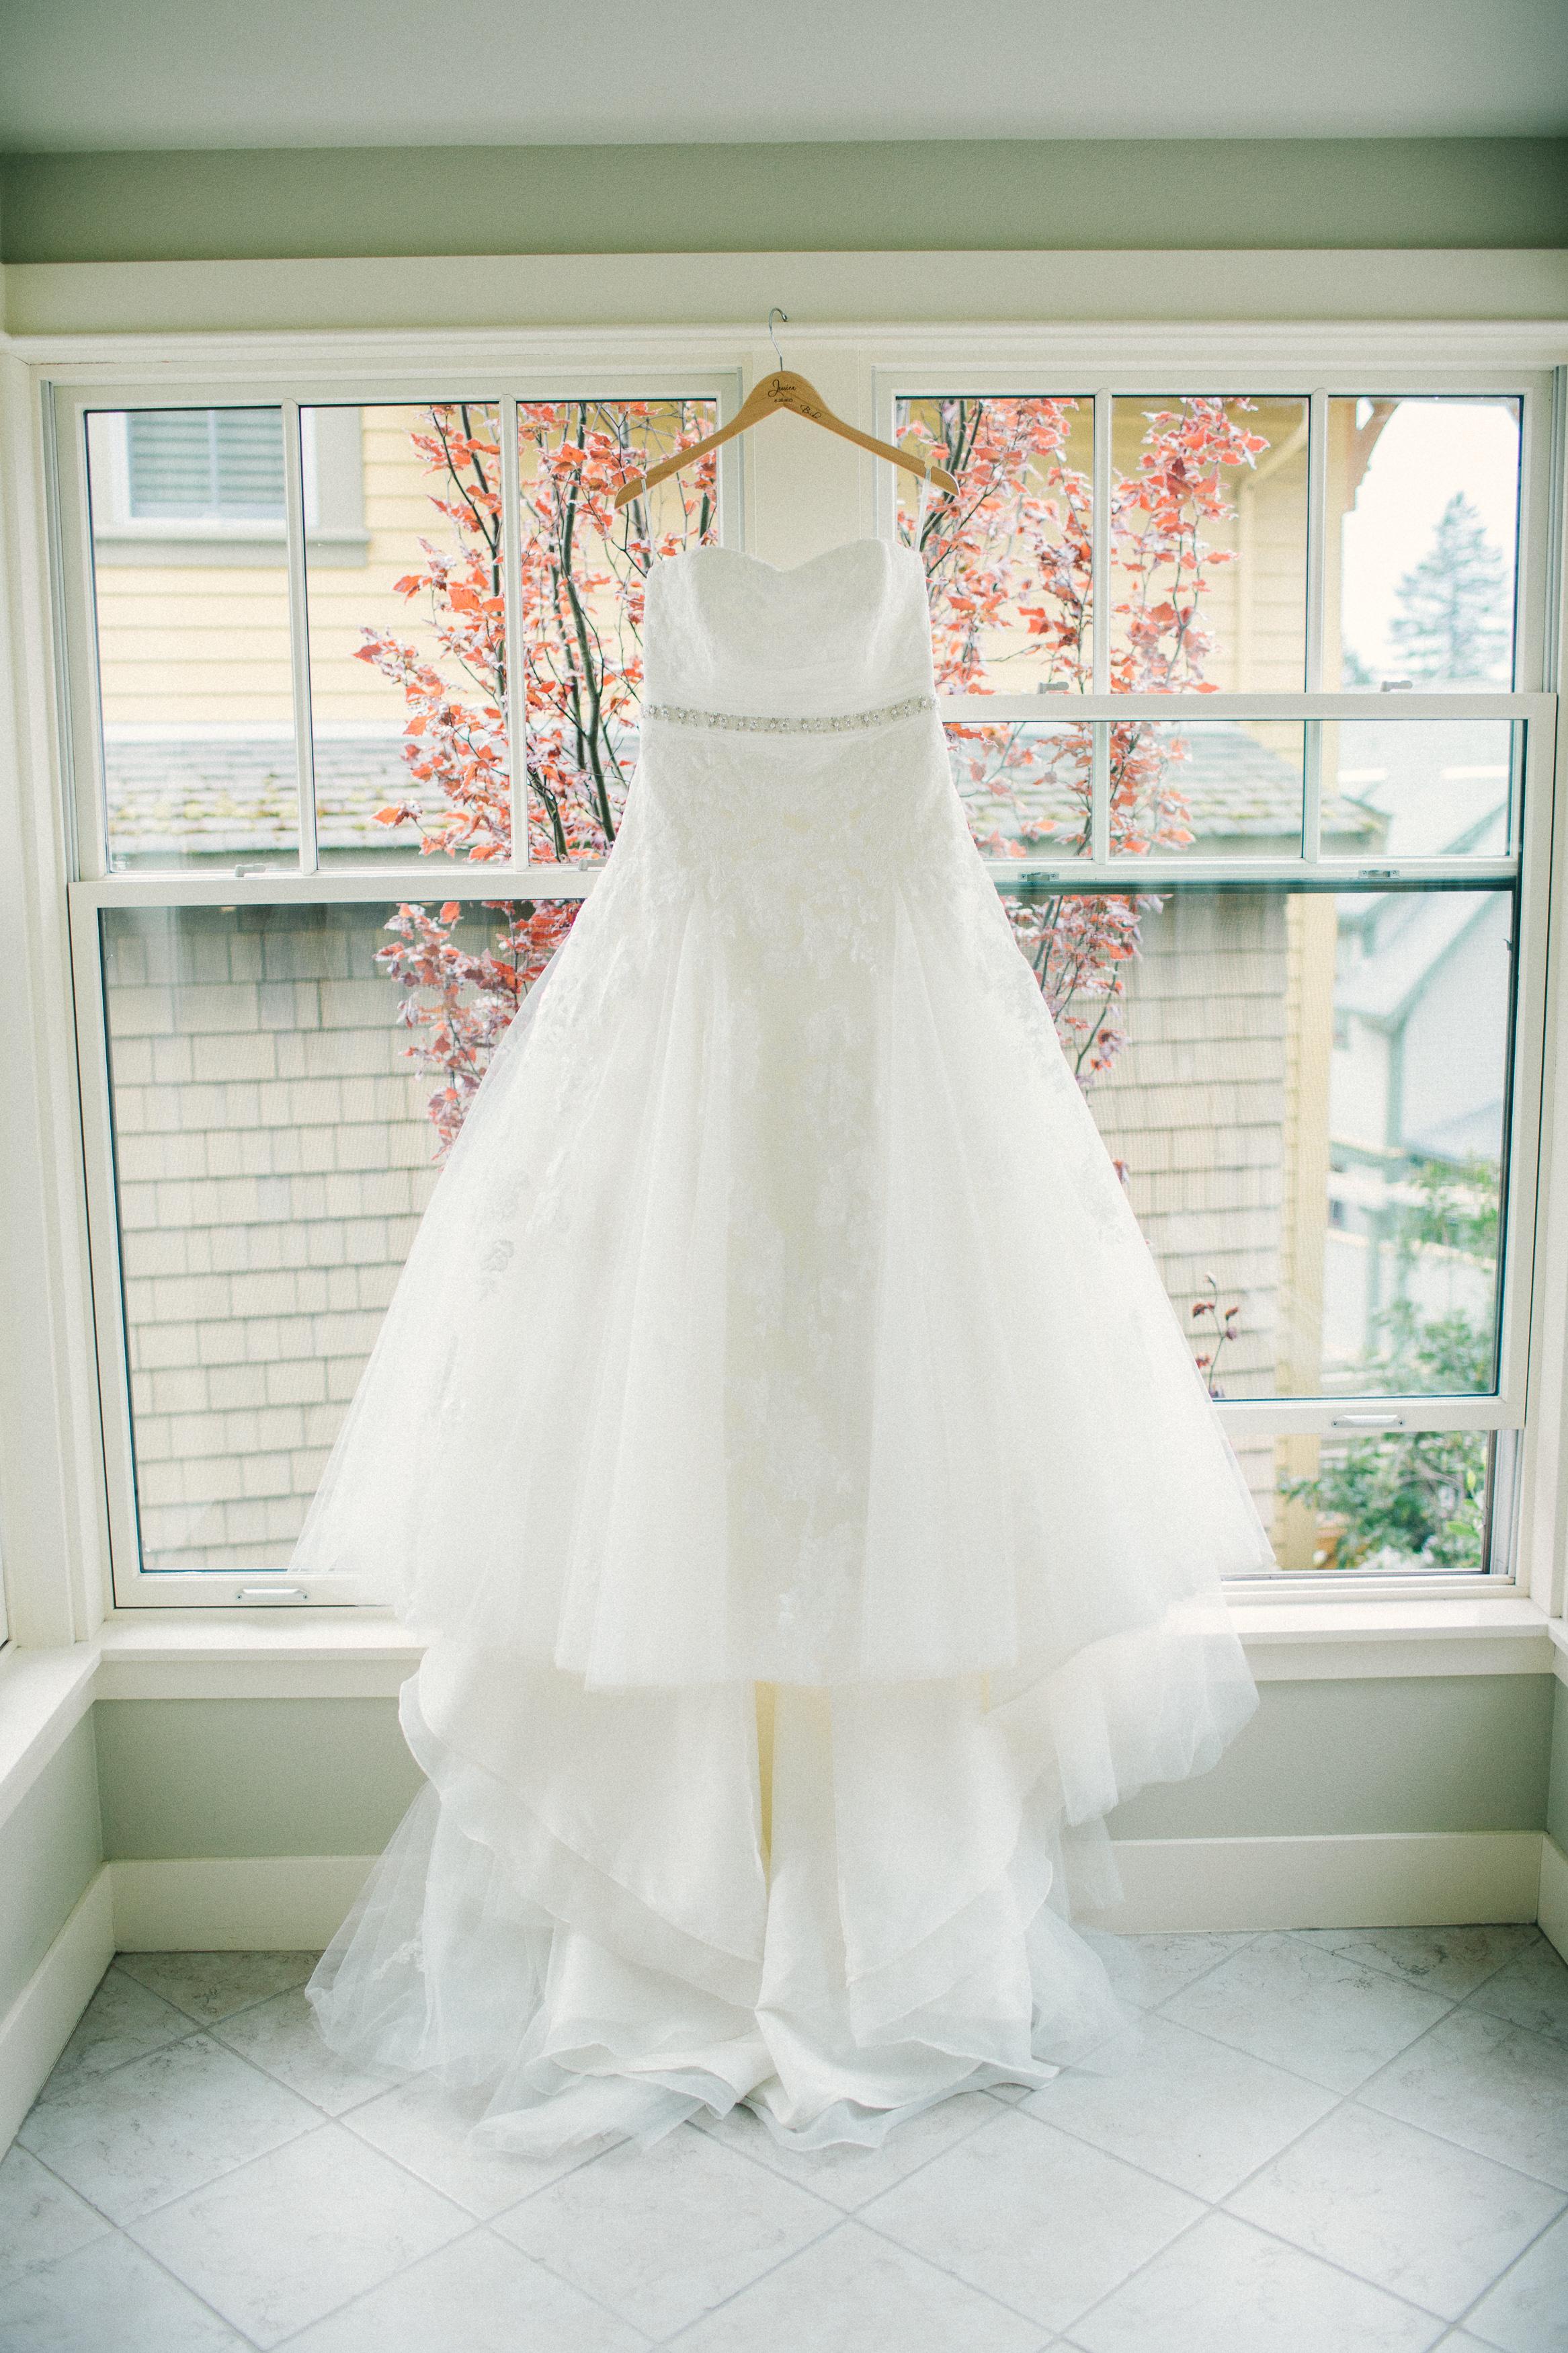 Roche Harbor Resort Wedding Planning | Roche Harbor Wedding Reception Venue | New Creations Wedding Design and Coordination